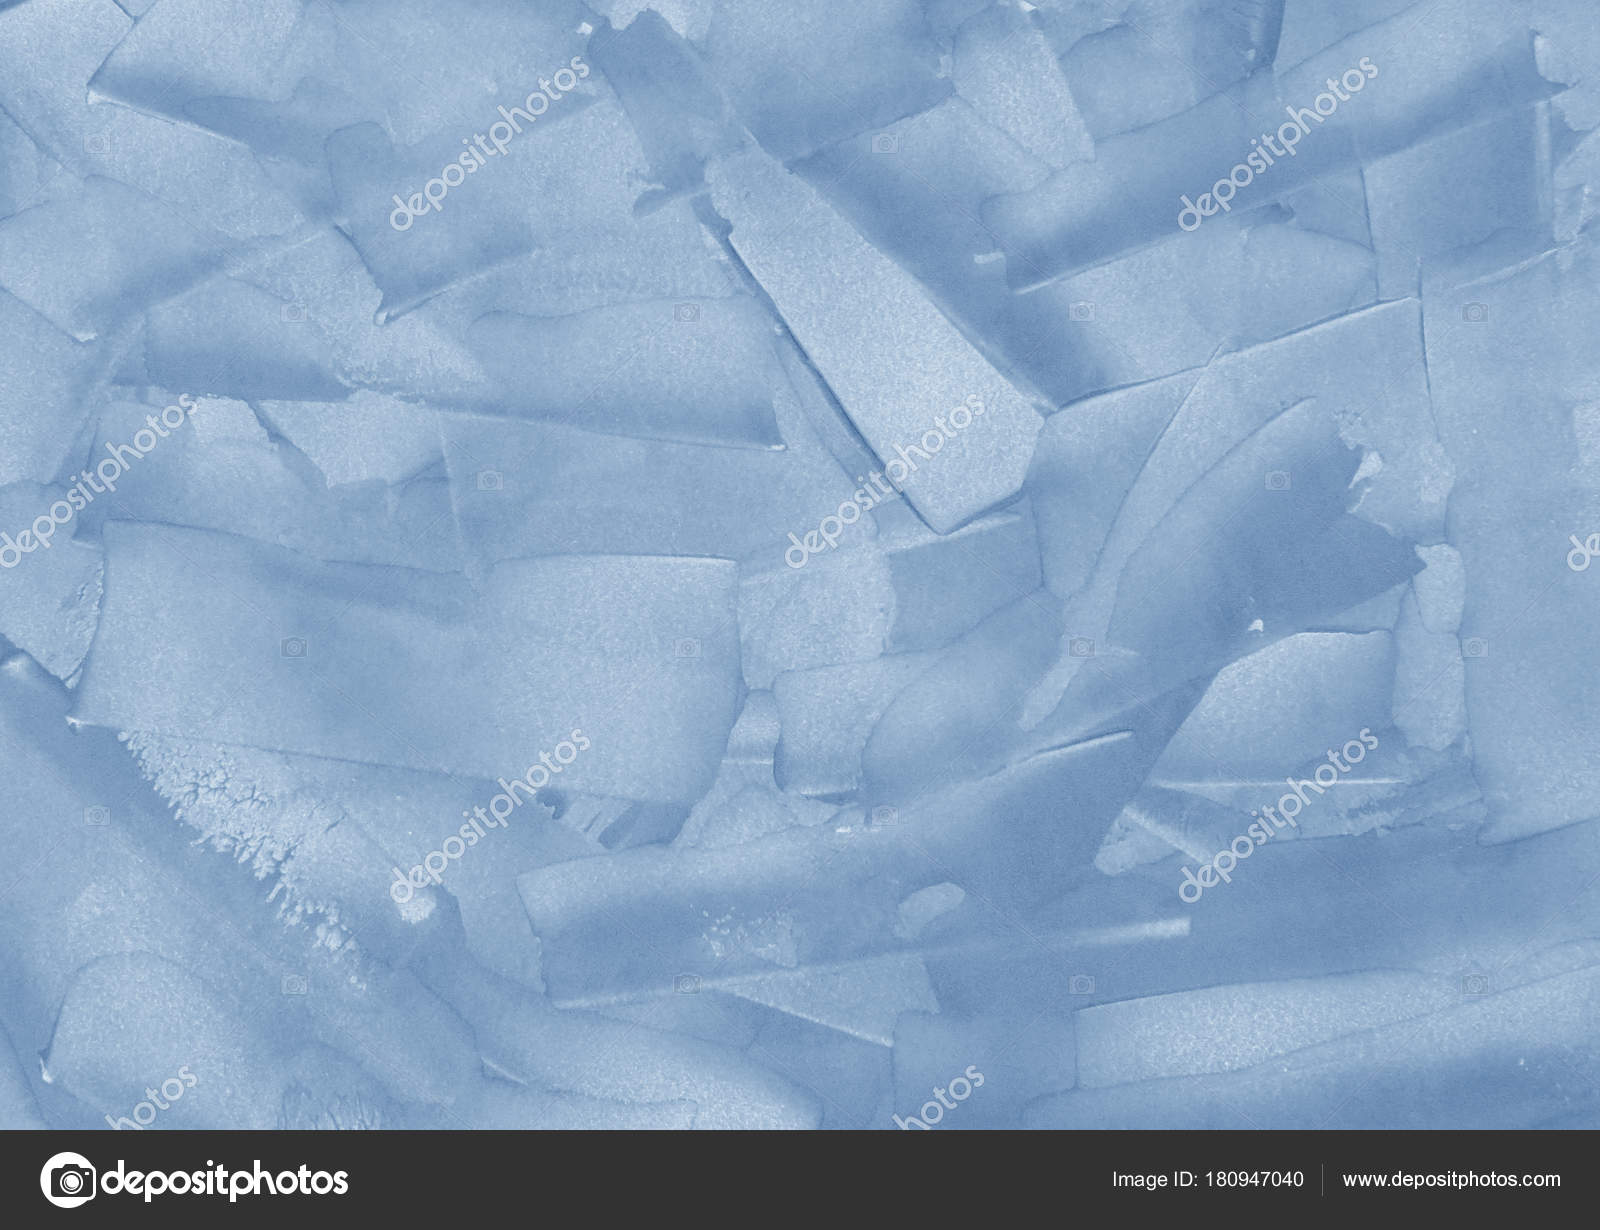 Venezianischer Stuck, Gips, Marmor Antik Wand Textur — Stockfoto ...